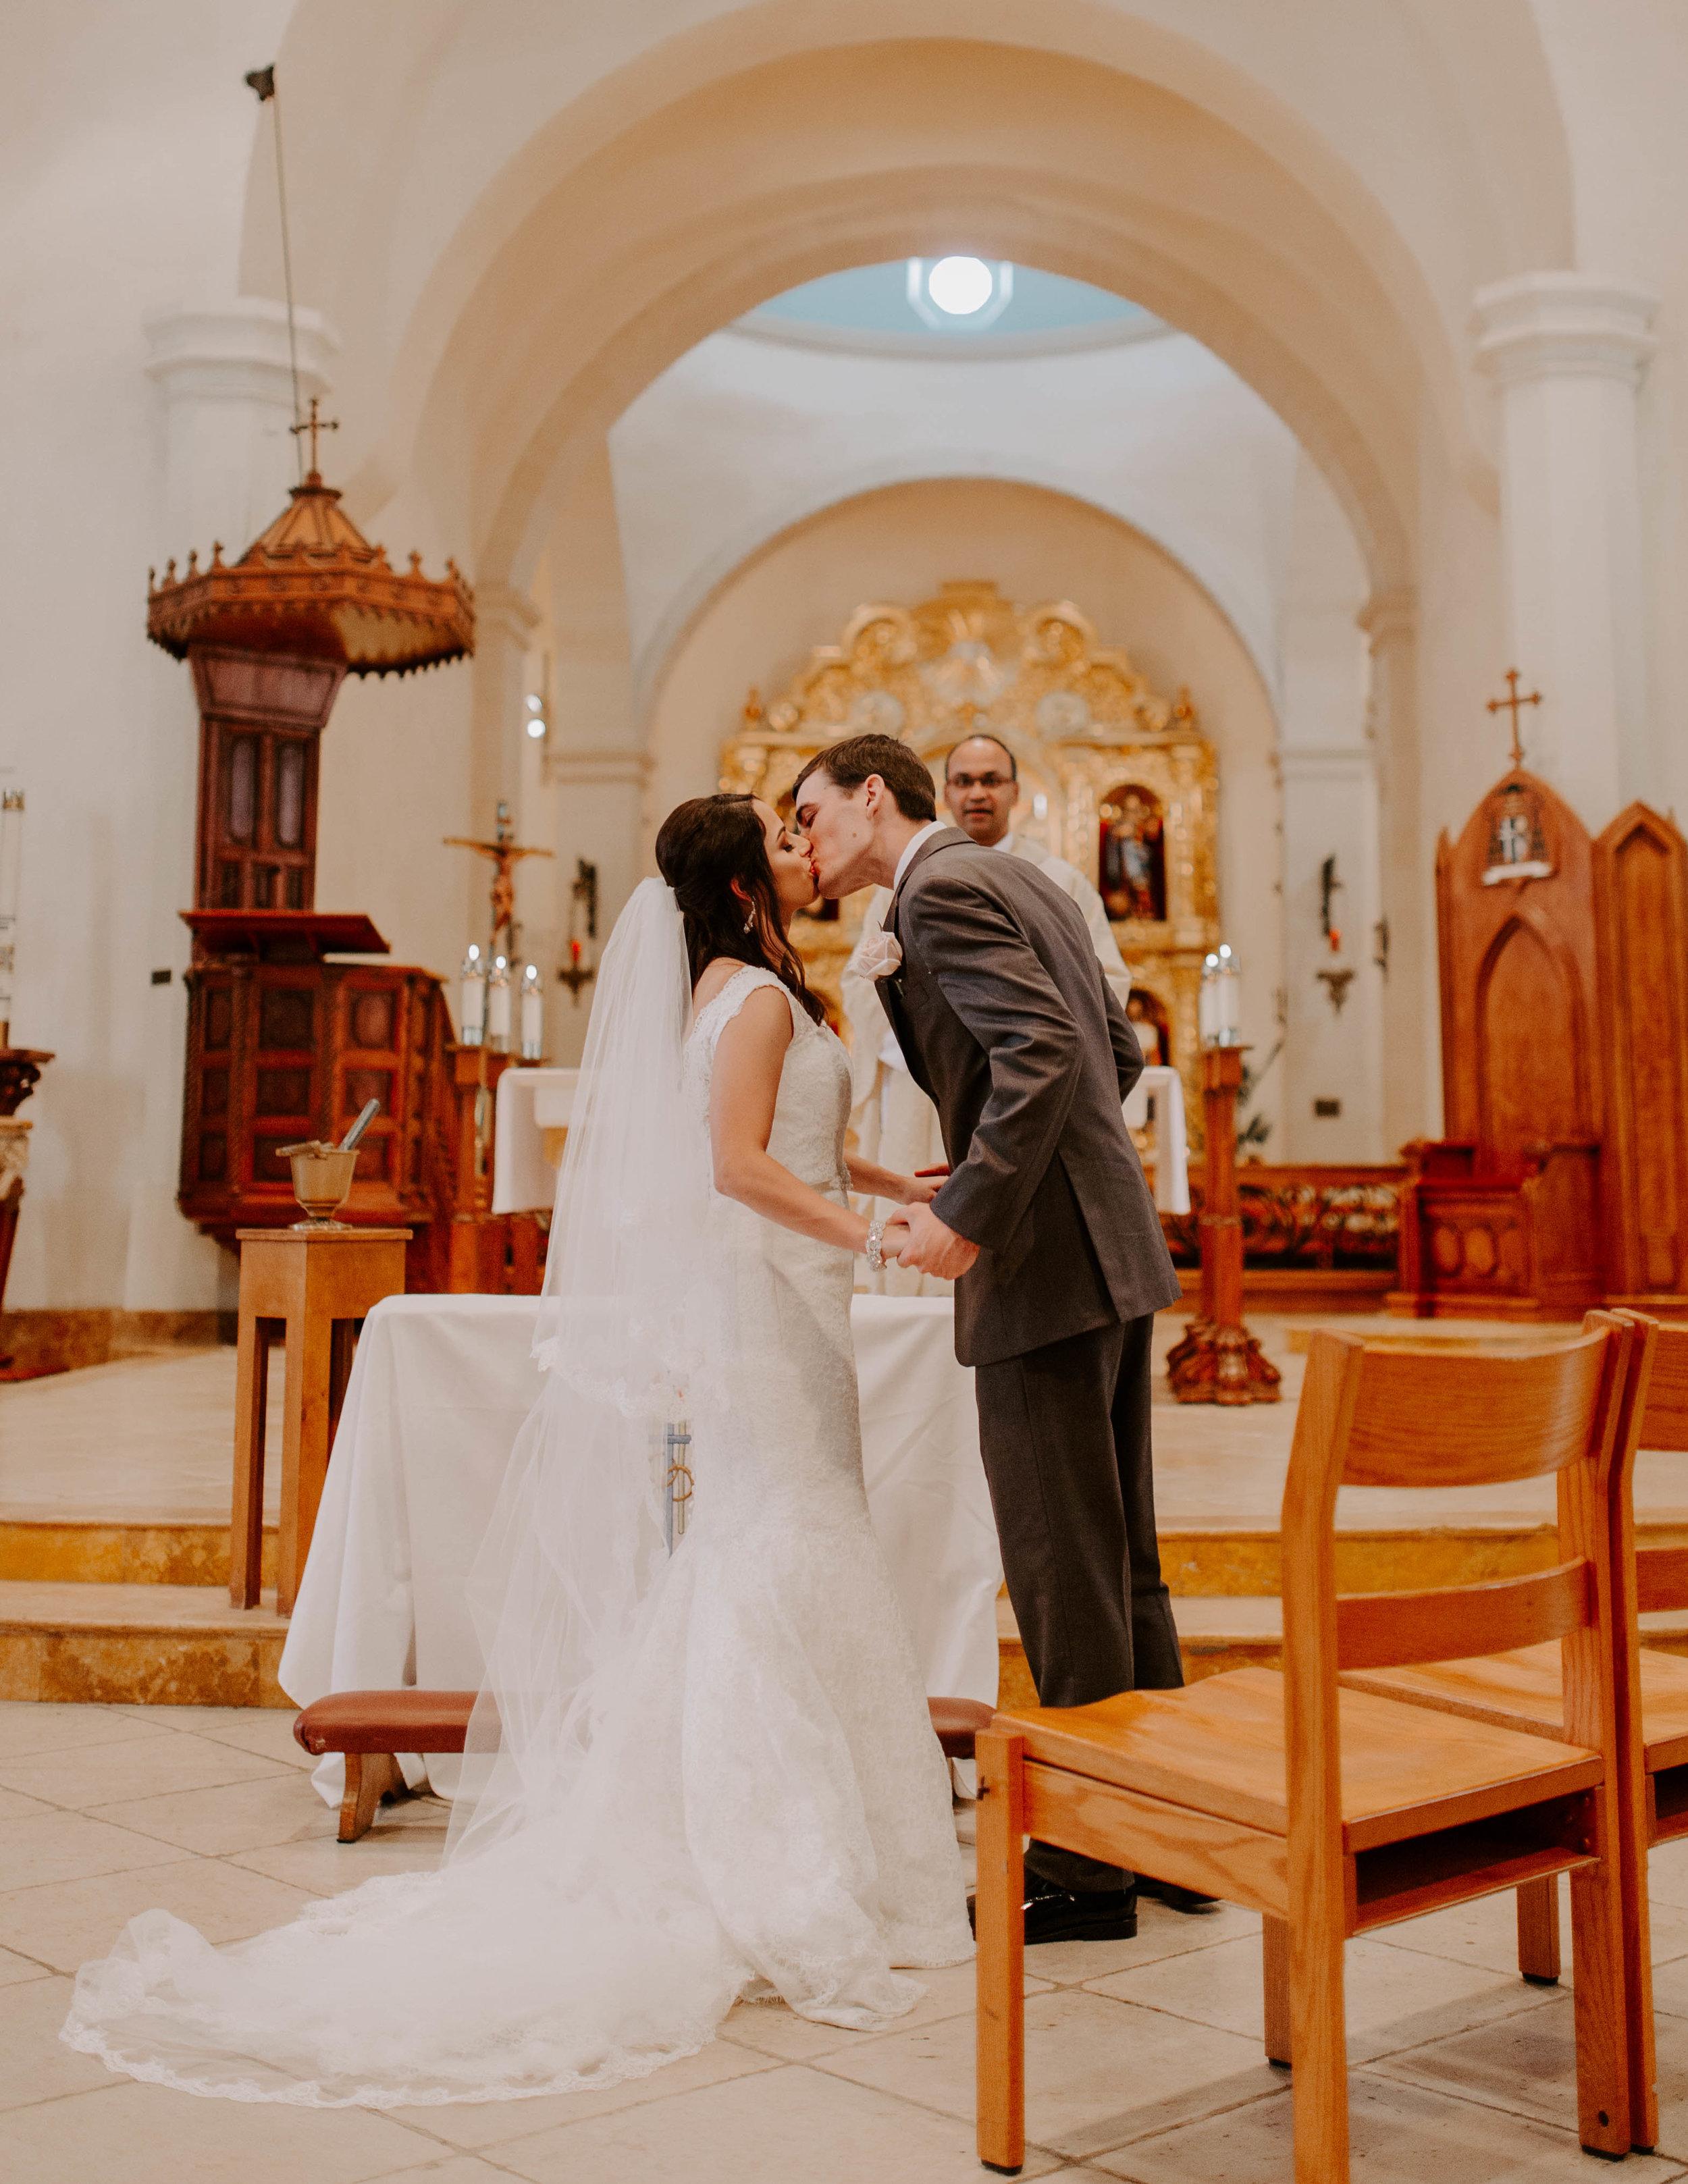 Marrisa_Nick_Wedding-277.jpg